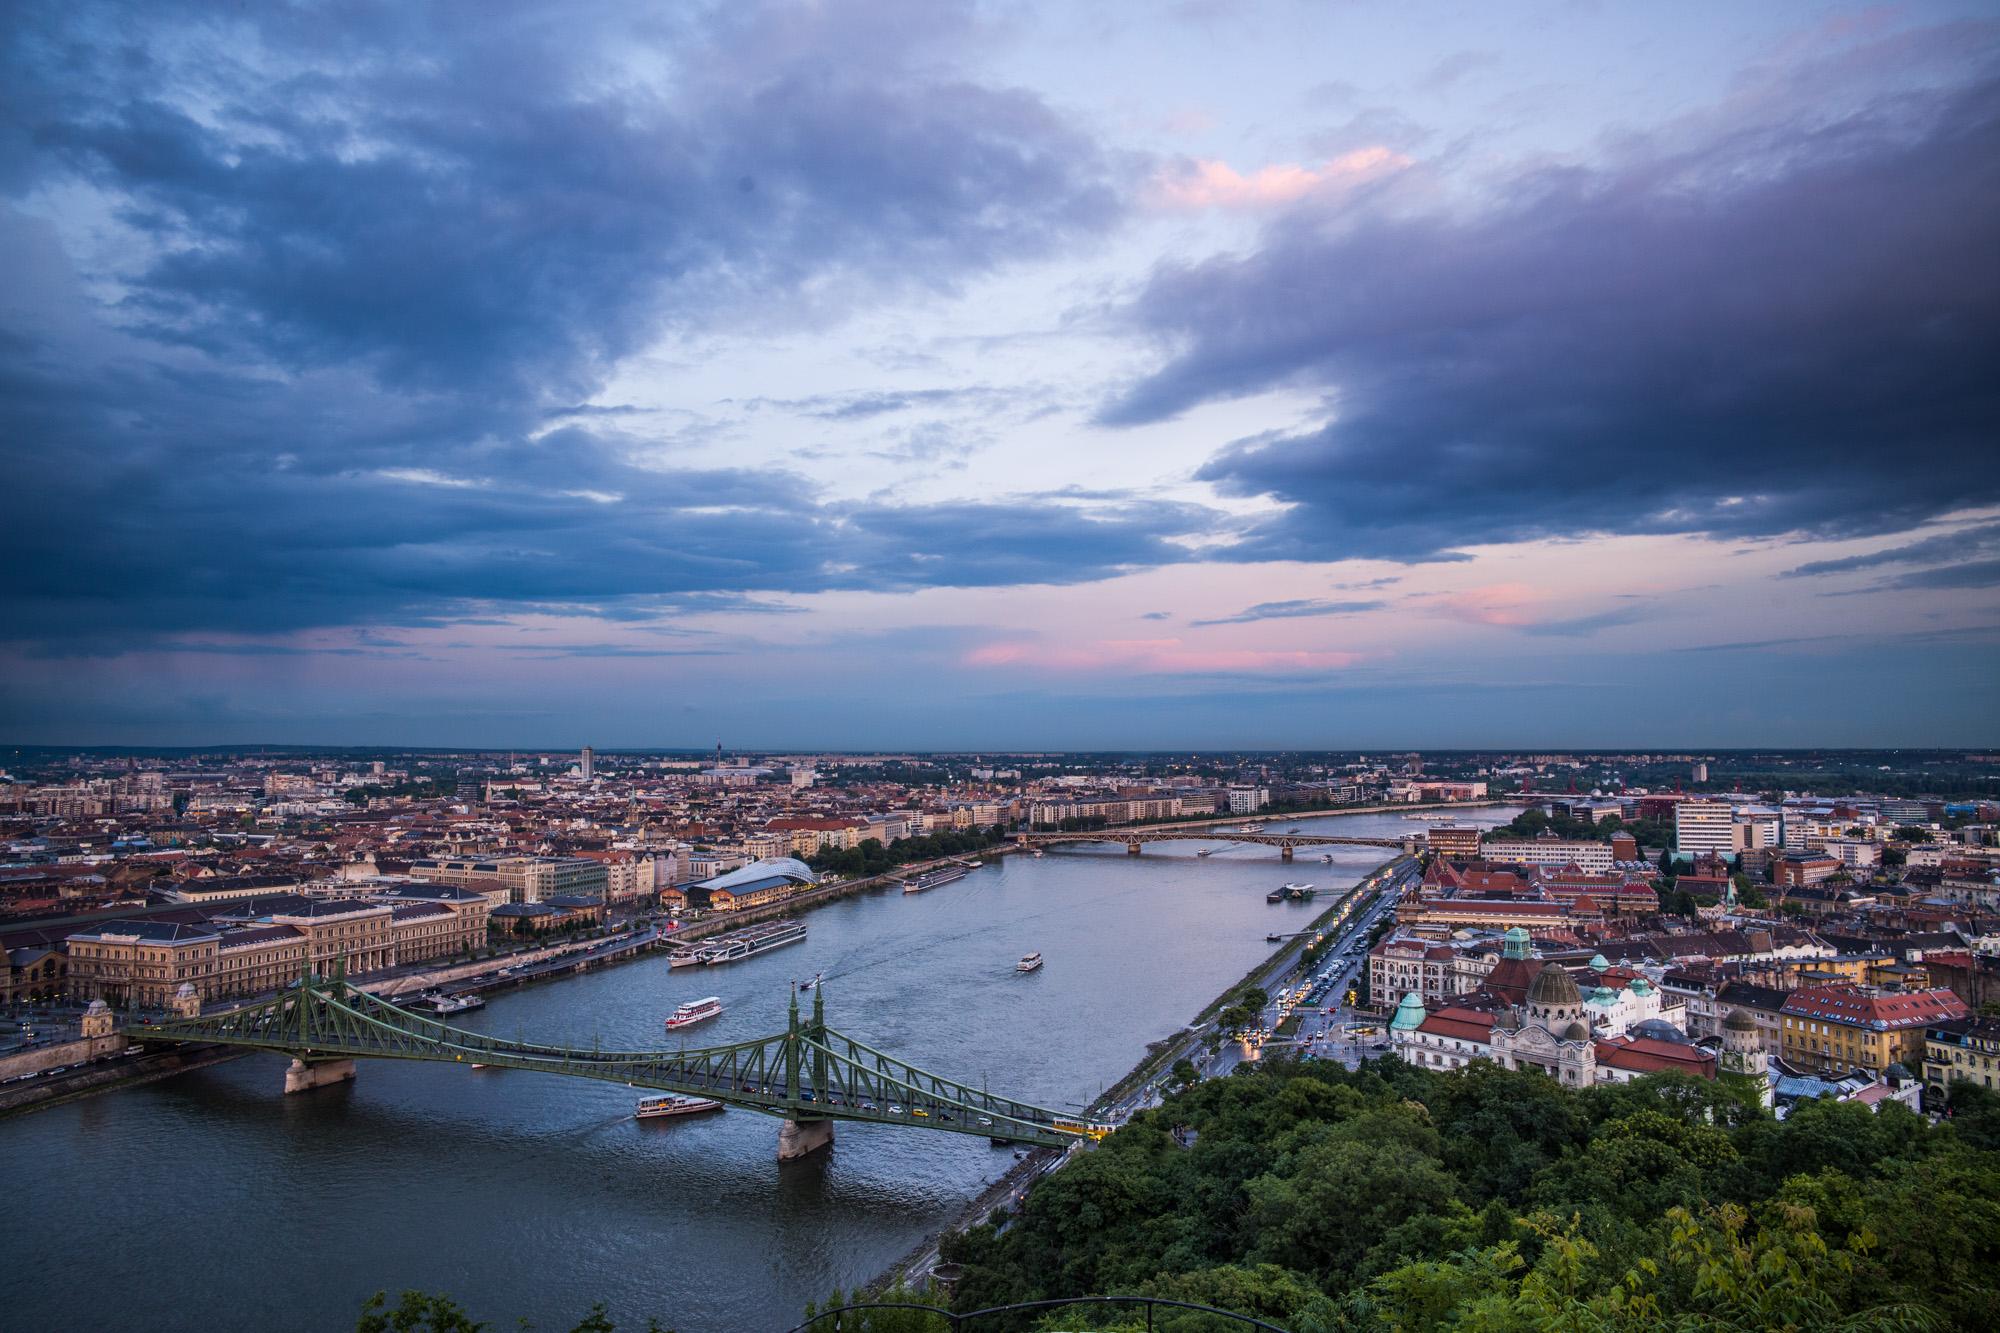 Bridges over the Danube in Budapest